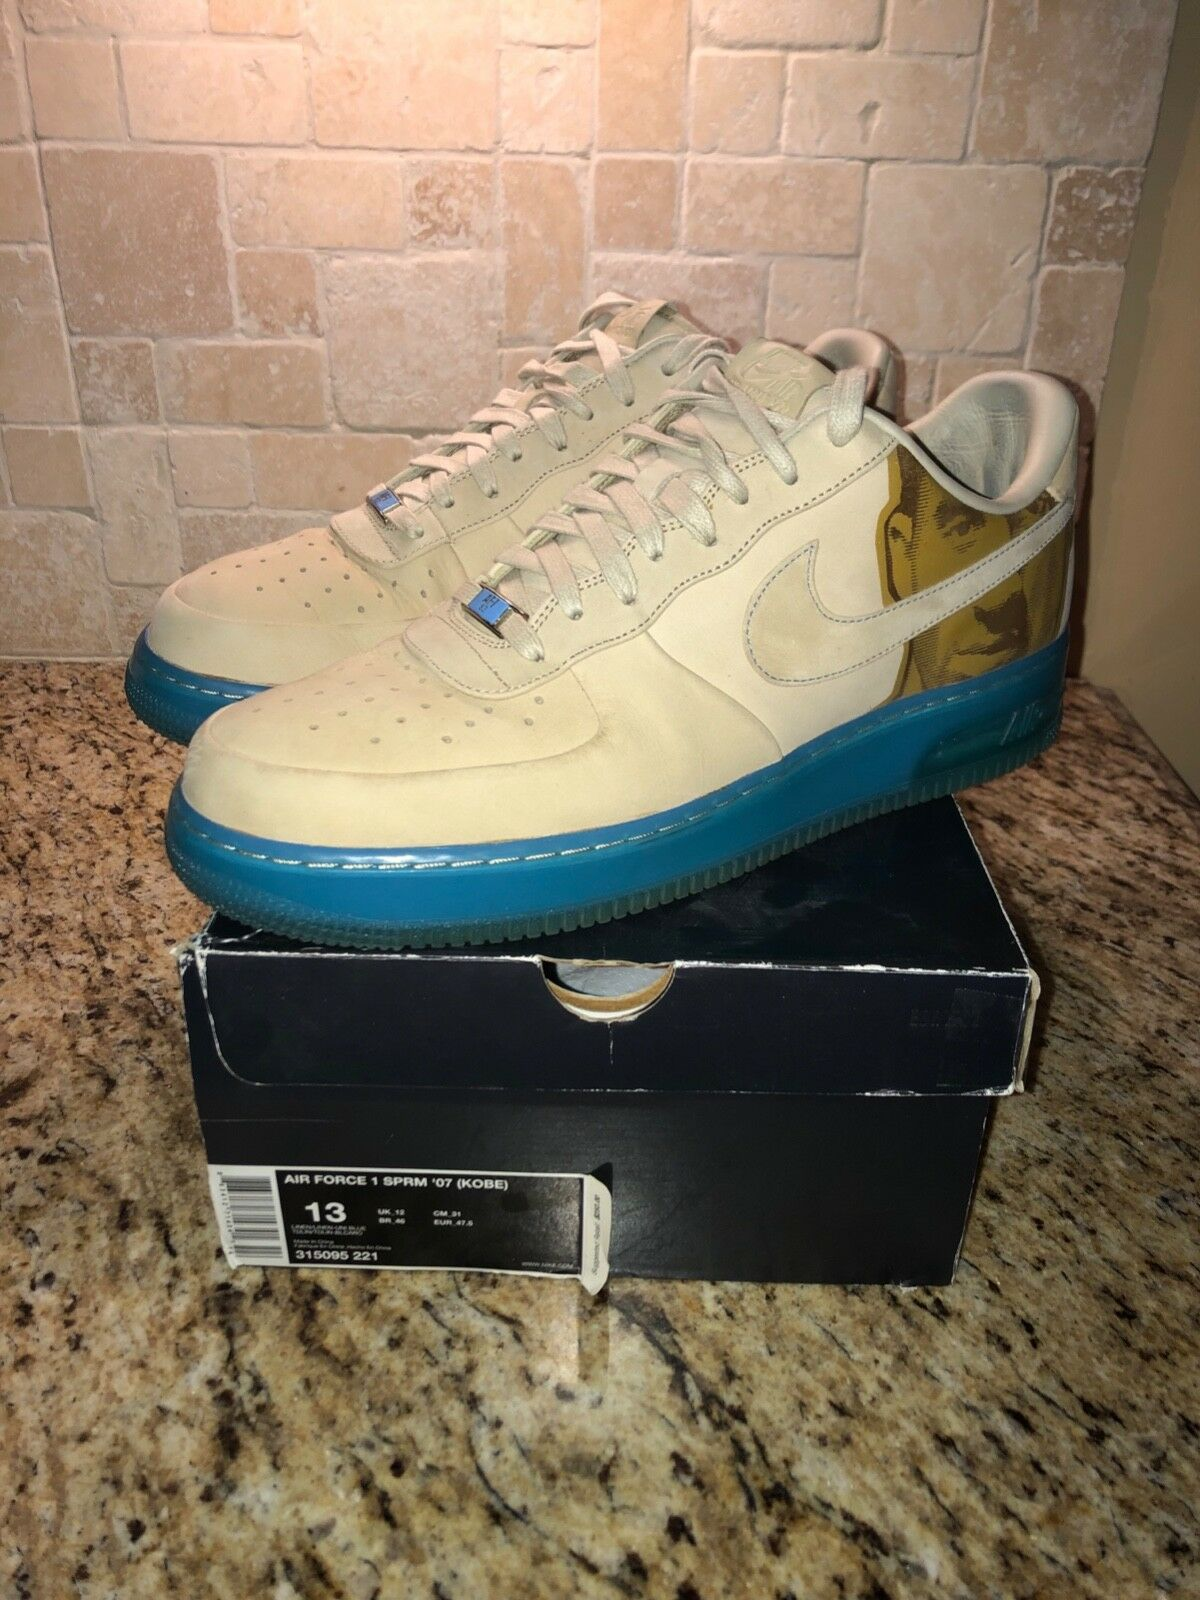 Nike Air Force 1 Supreme Kobe mens size 13